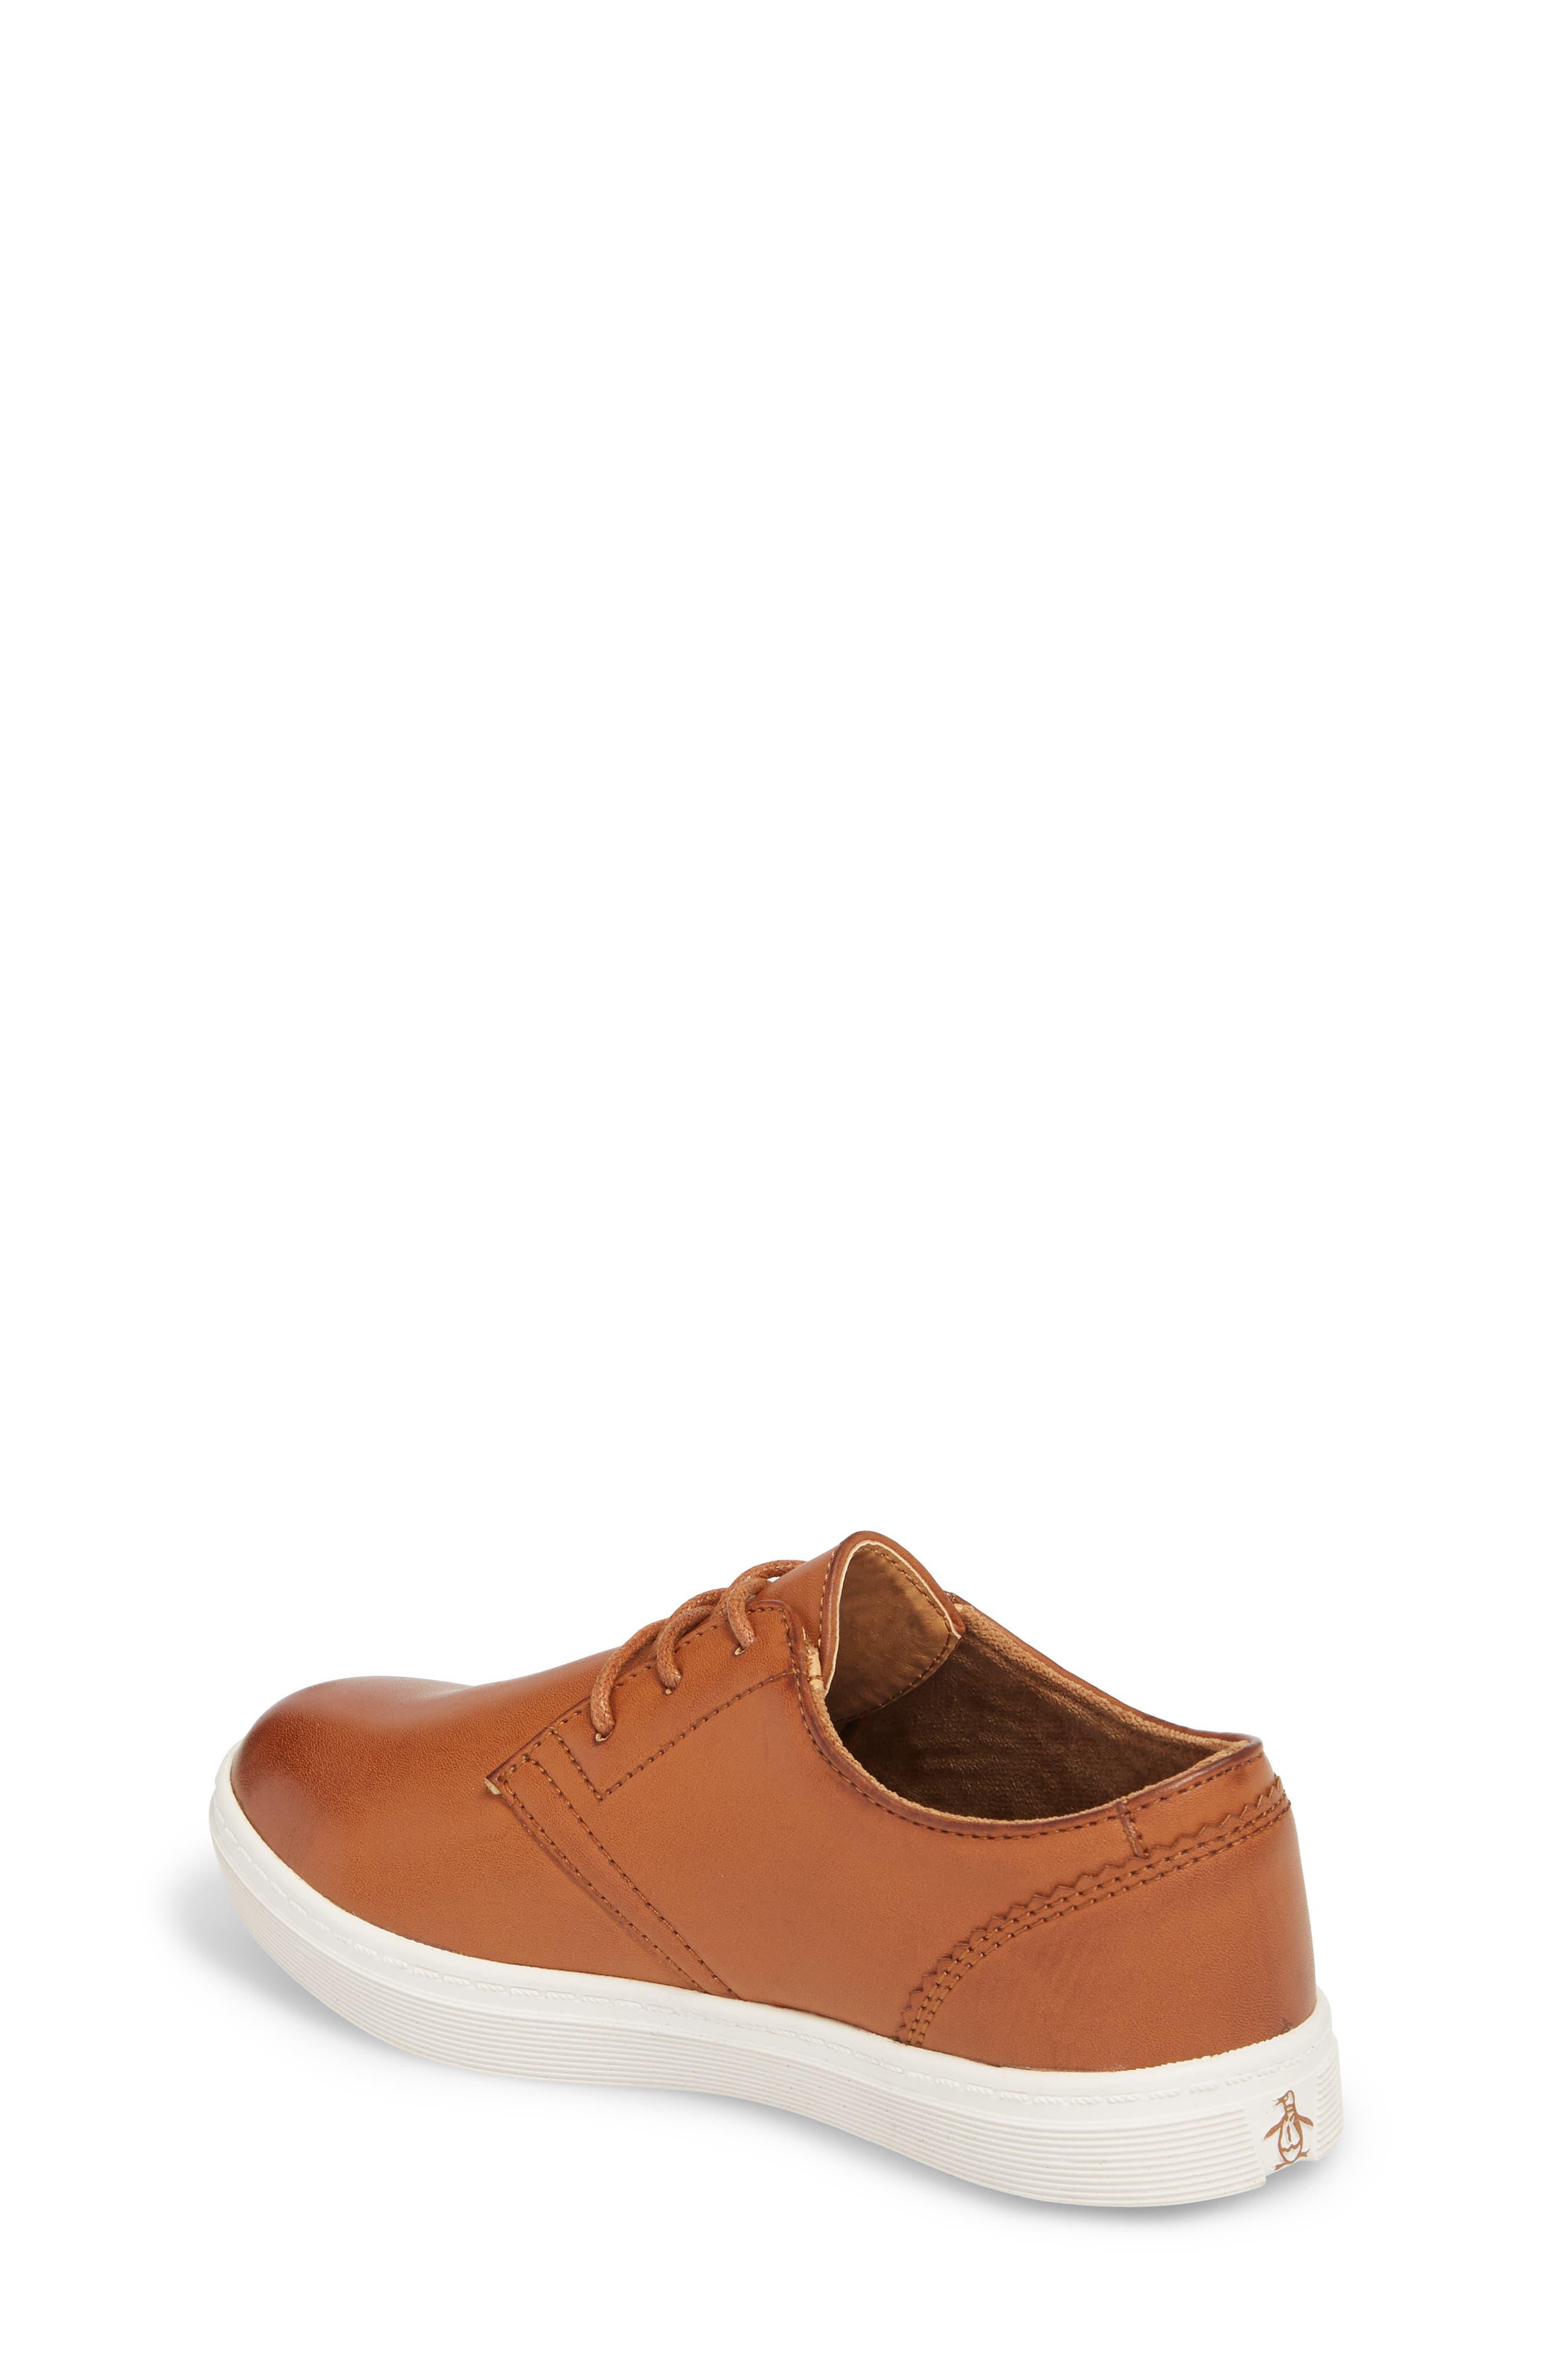 Freeland Sneaker,                             Alternate thumbnail 2, color,                             COGNAC